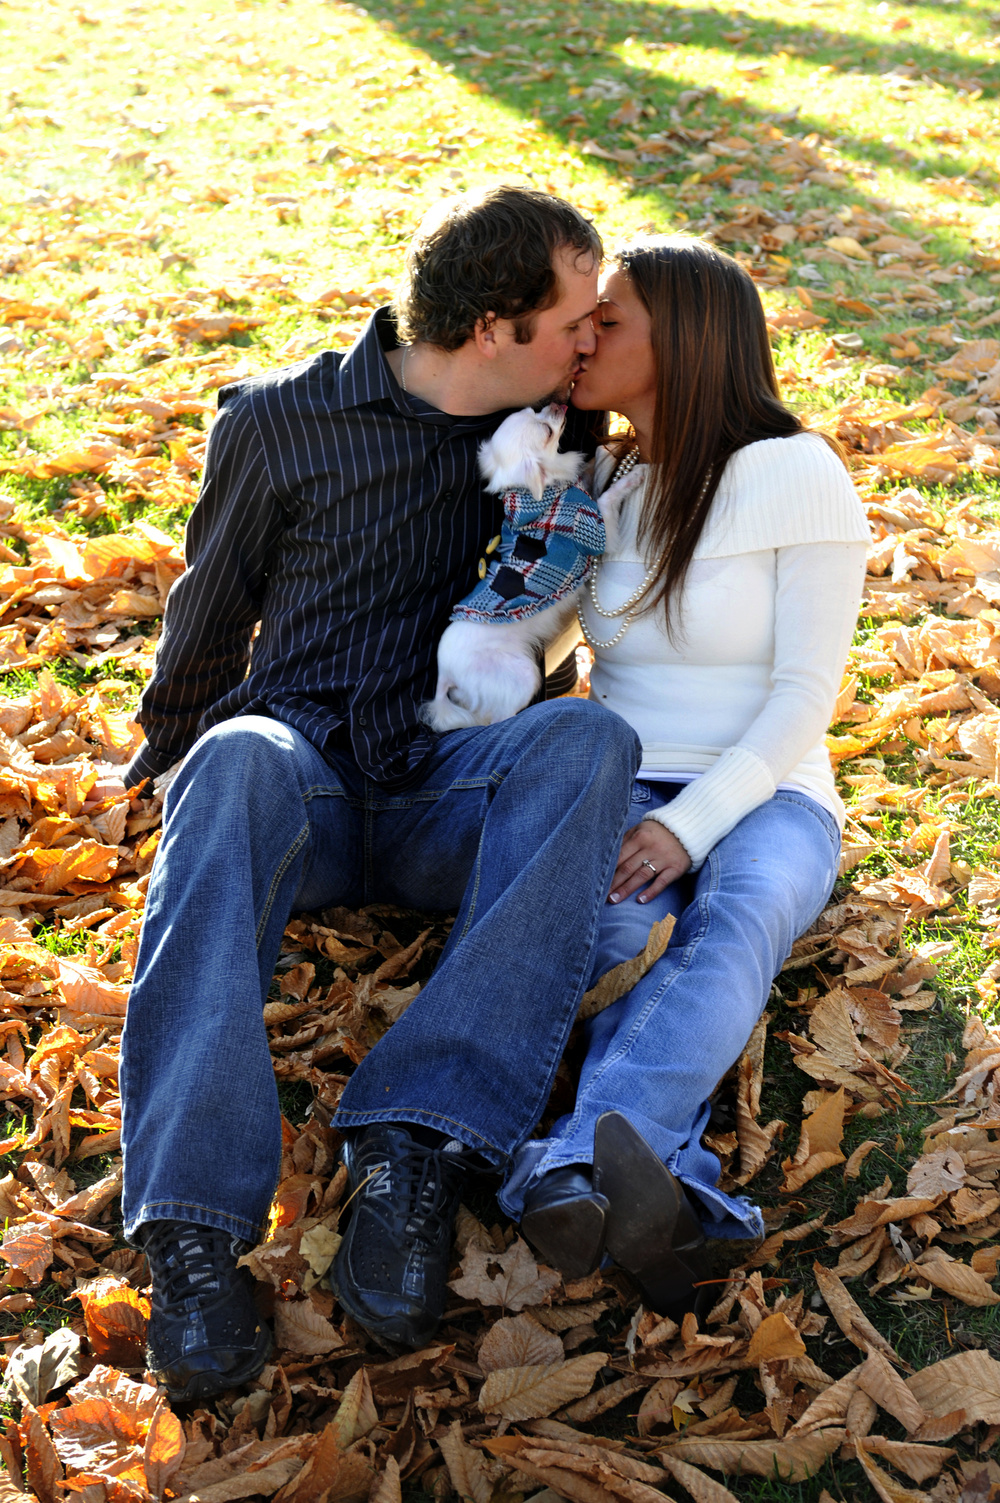 Couple kissing_12563632_Subscription_L.jpg